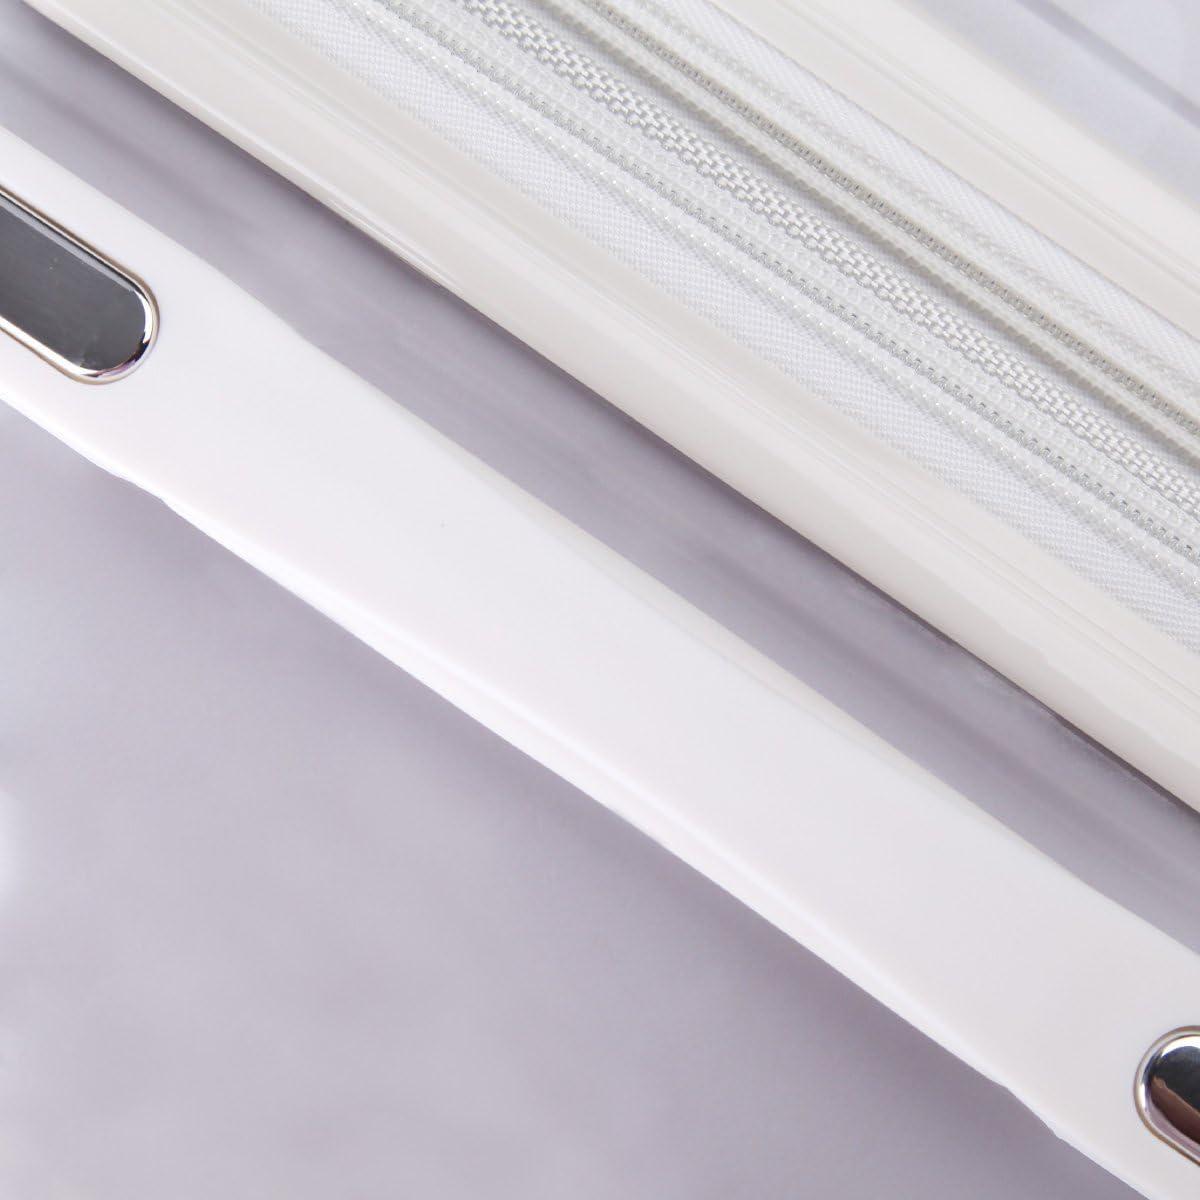 24 inch WAOWAO multicolor hardside luggage